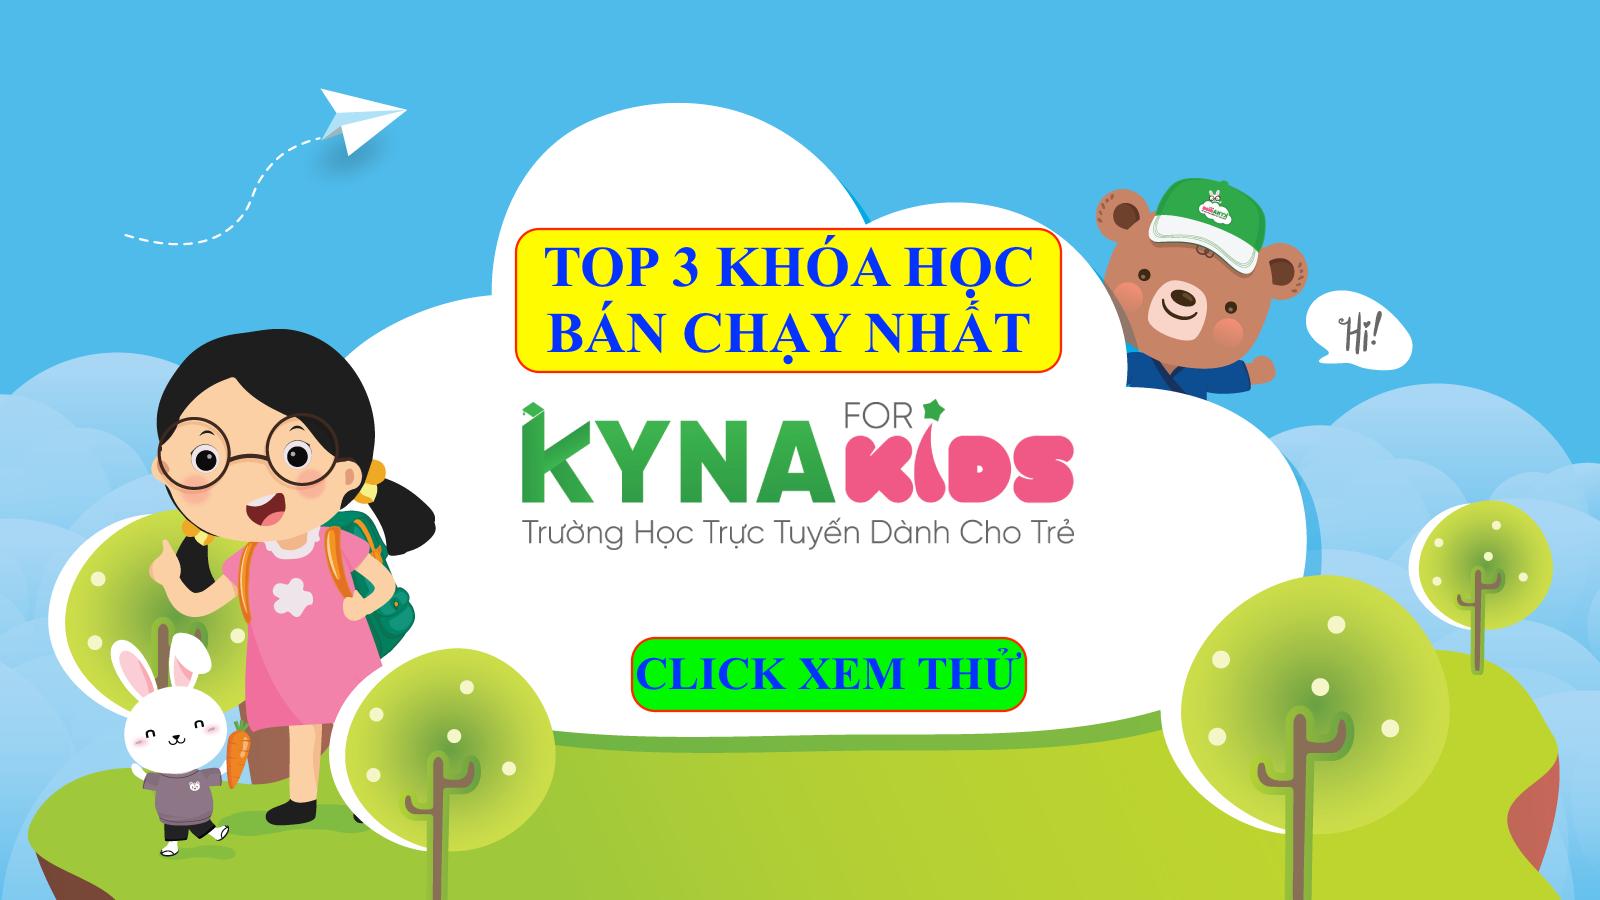 Kynaforkids.vn - Kyna English - Kyna Soroban - Siêu trí nhớ